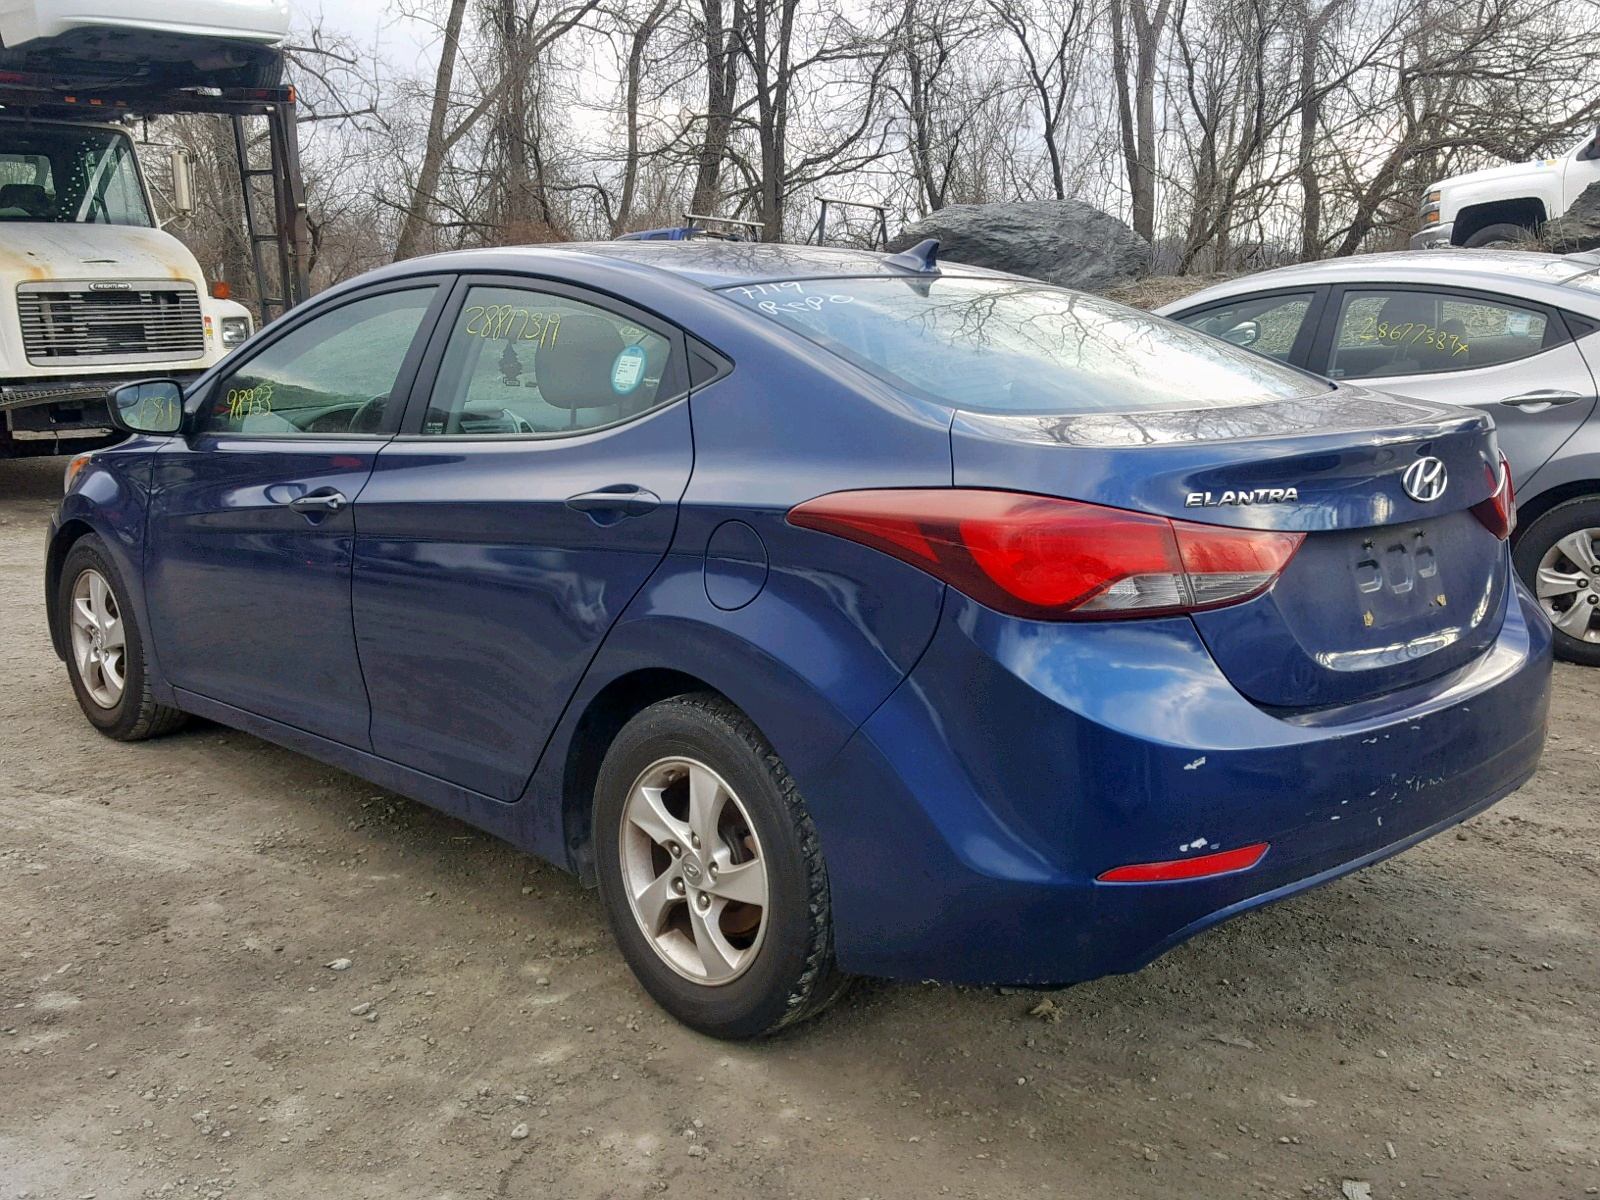 2015 Hyundai Elantra Se 1.8L [Angle] View